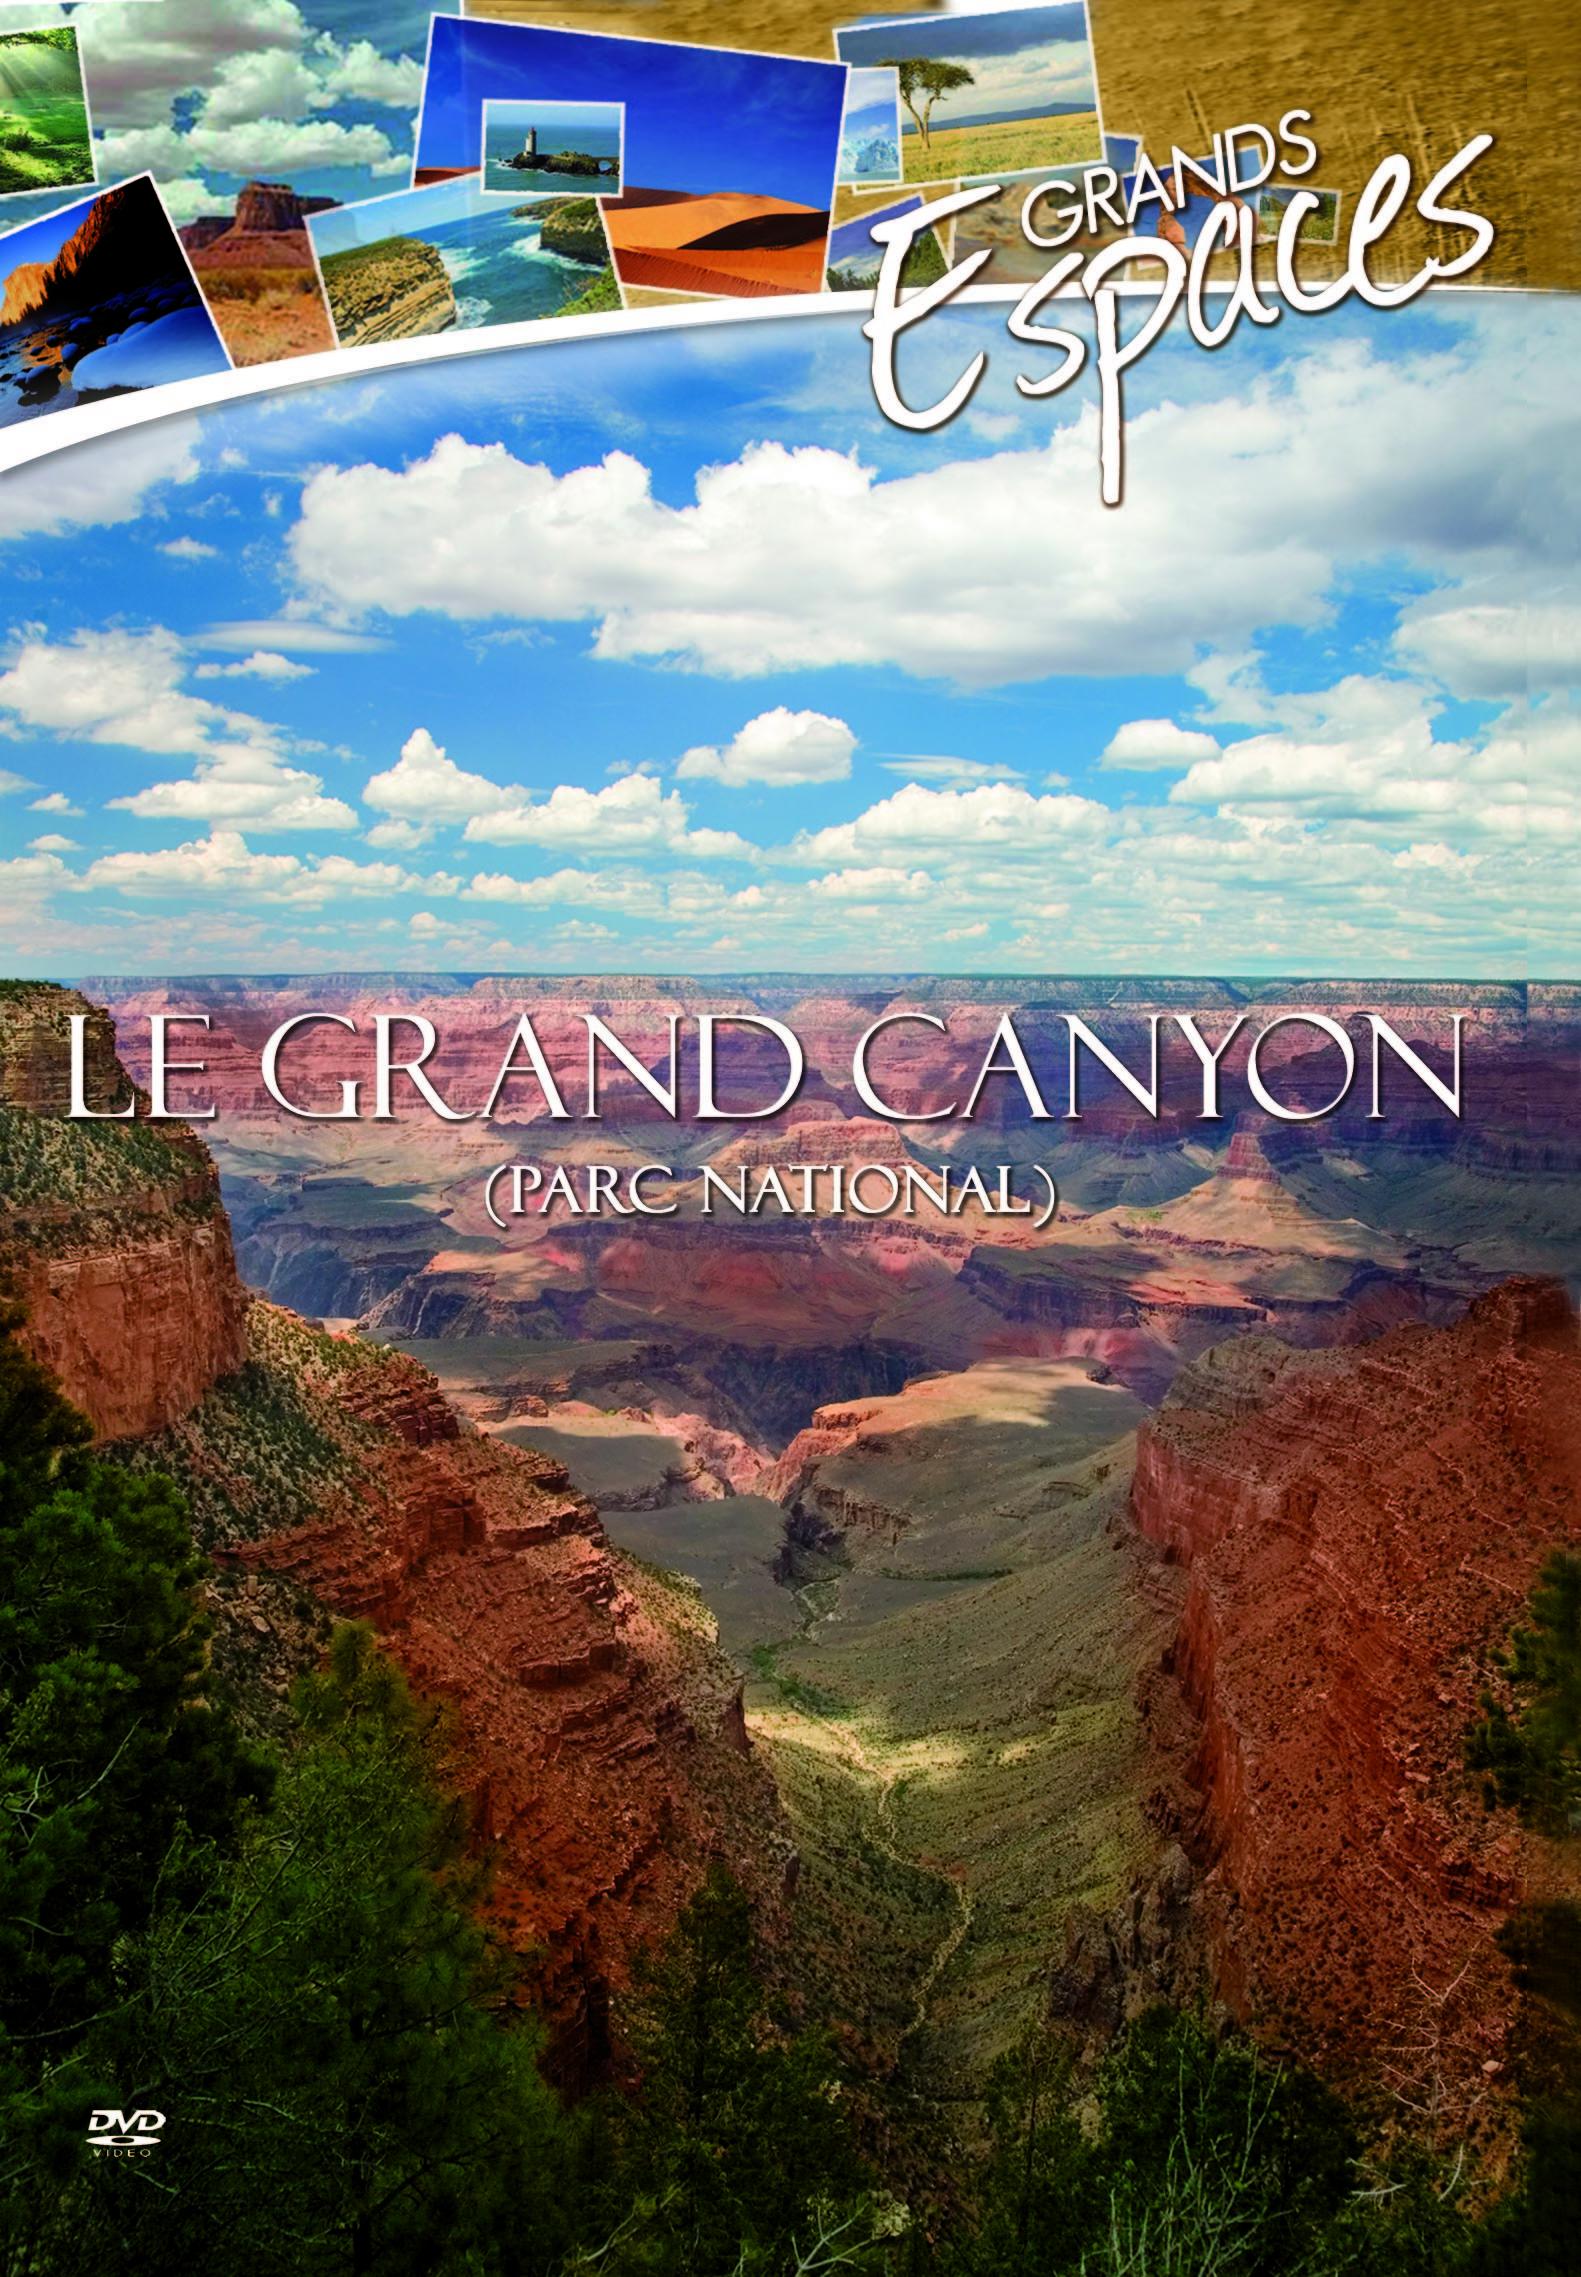 LE GRAND CAYON - DVD  GRANDS ESPACES VOL 2